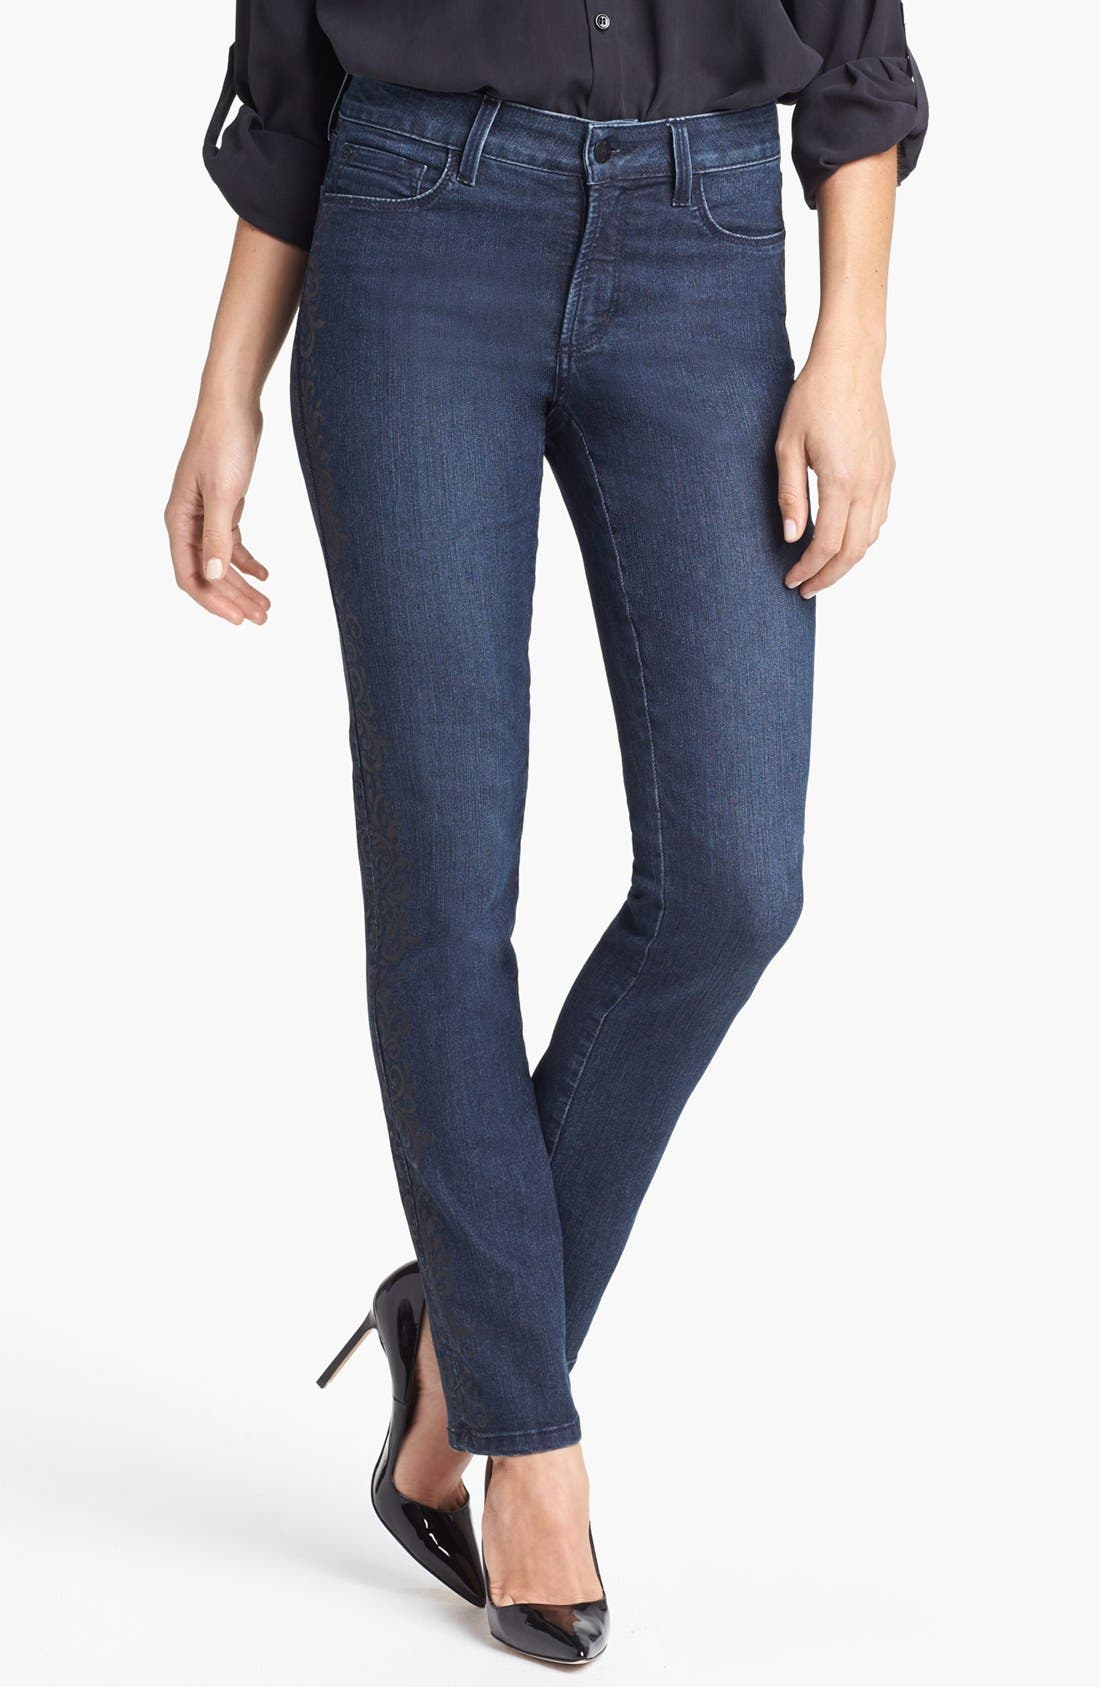 Main Image - NYDJ 'Sheri' Lace Detail Stretch Skinny Stretch Jeans (Old River)